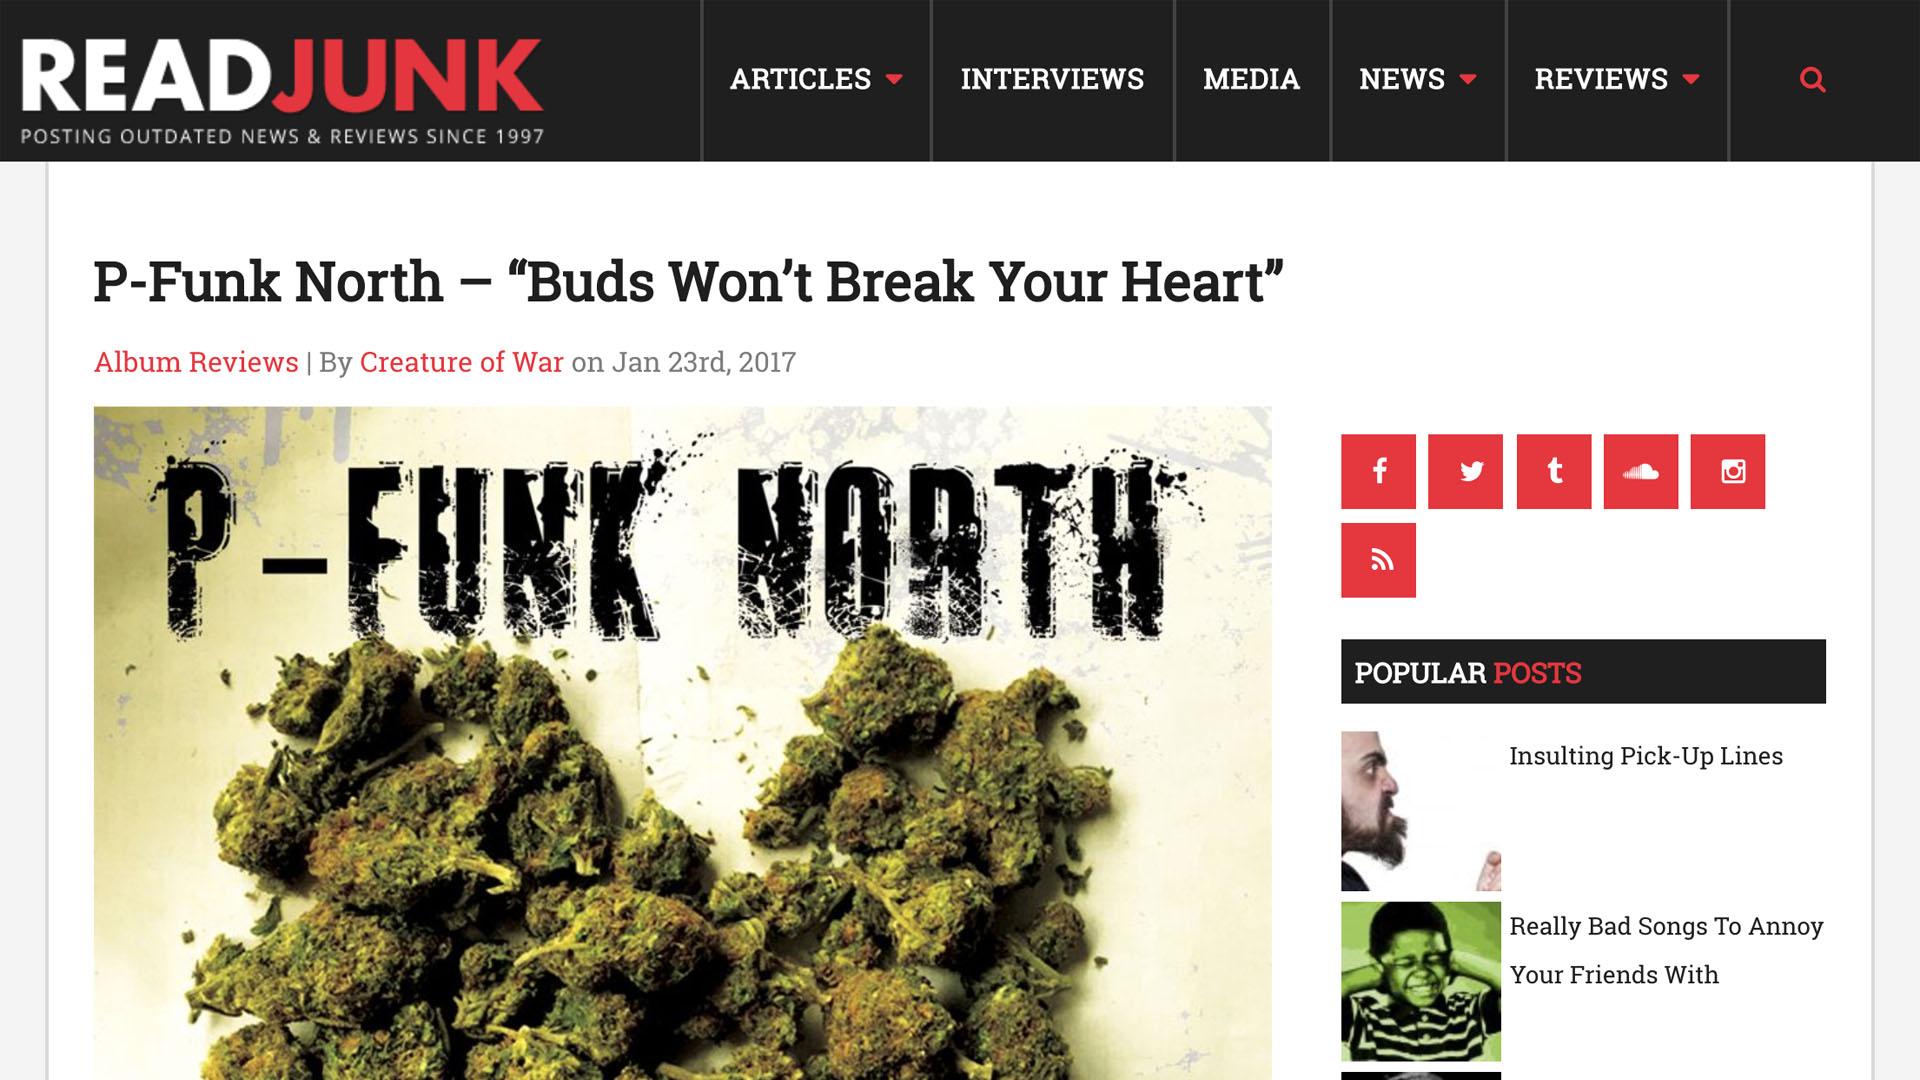 https://www.readjunk.com/reviews/albumreviews/p-funk-north-buds-wont-break-your-heart/